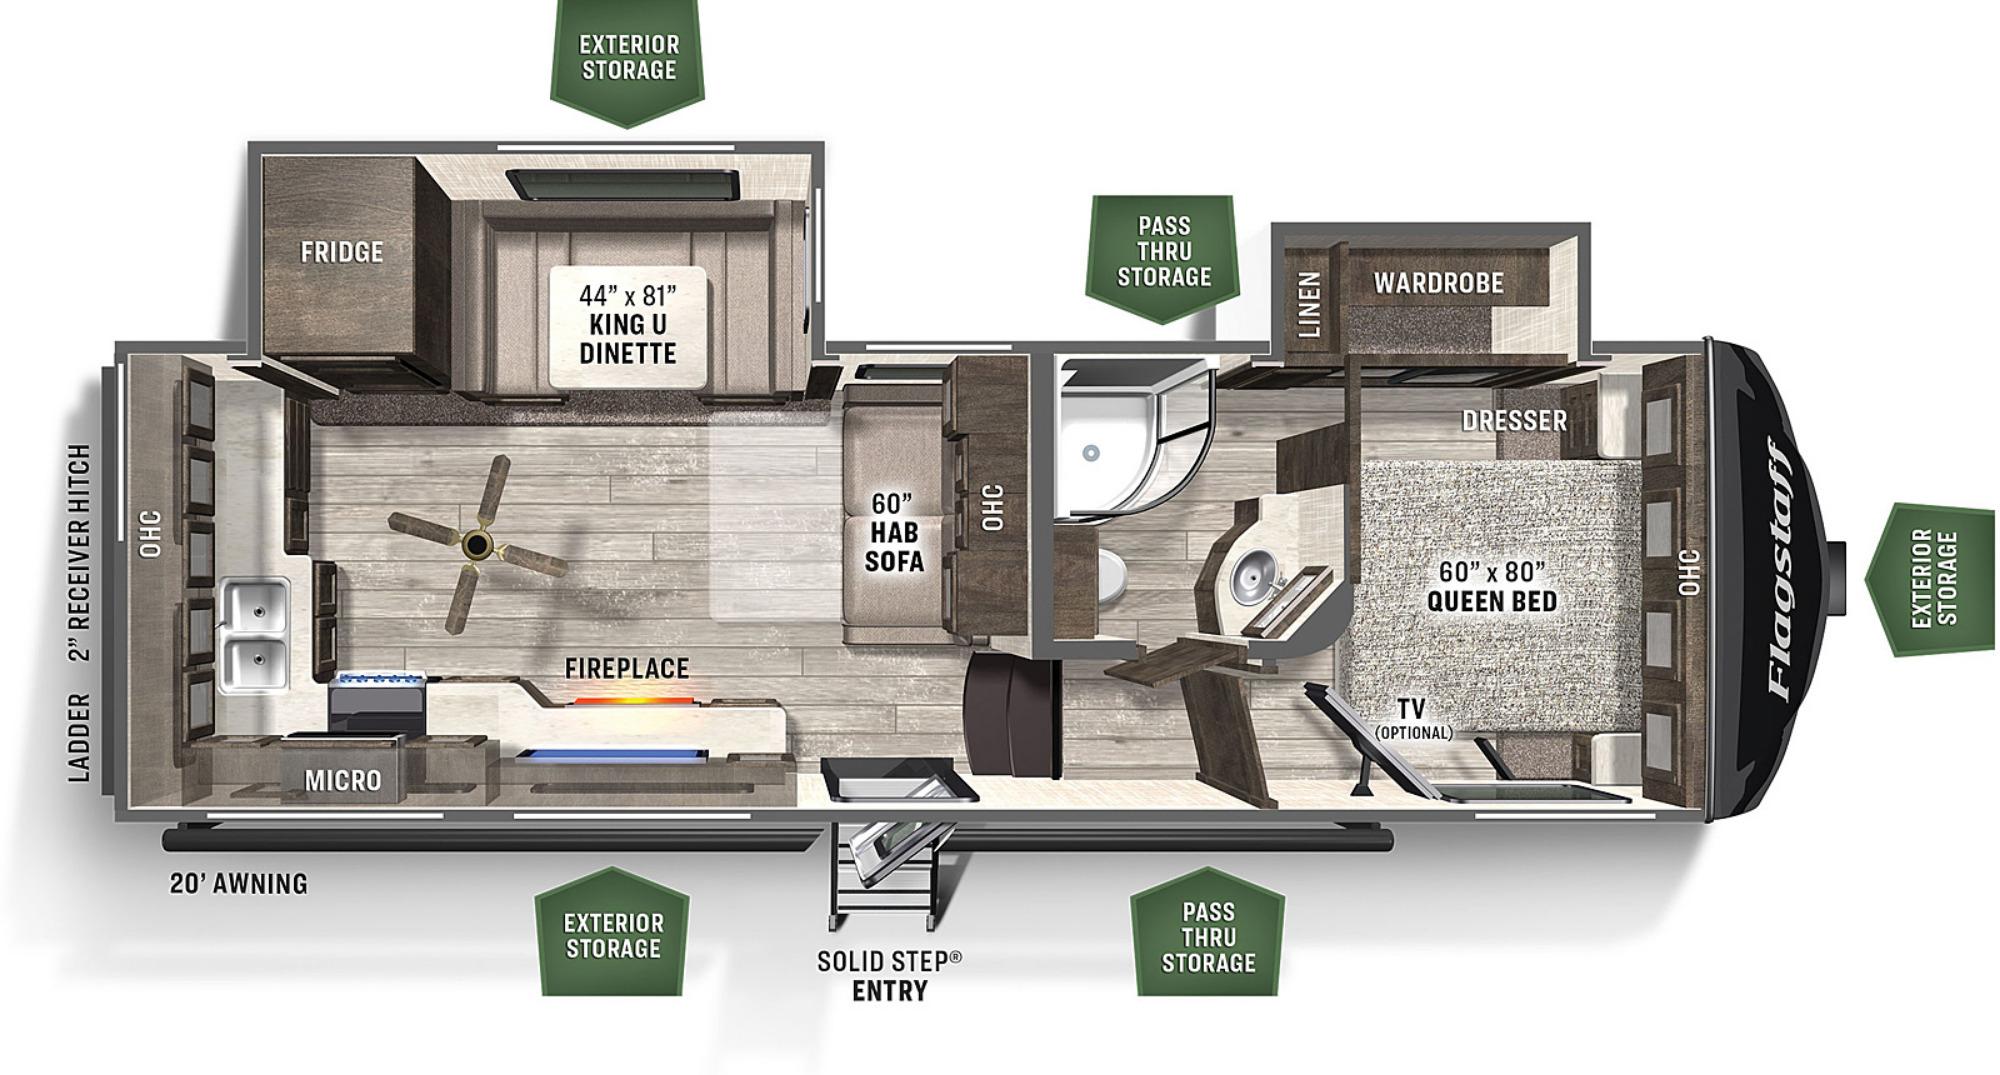 View Floor Plan for 2021 FOREST RIVER FLAGSTAFF SUPER LITE 526RK